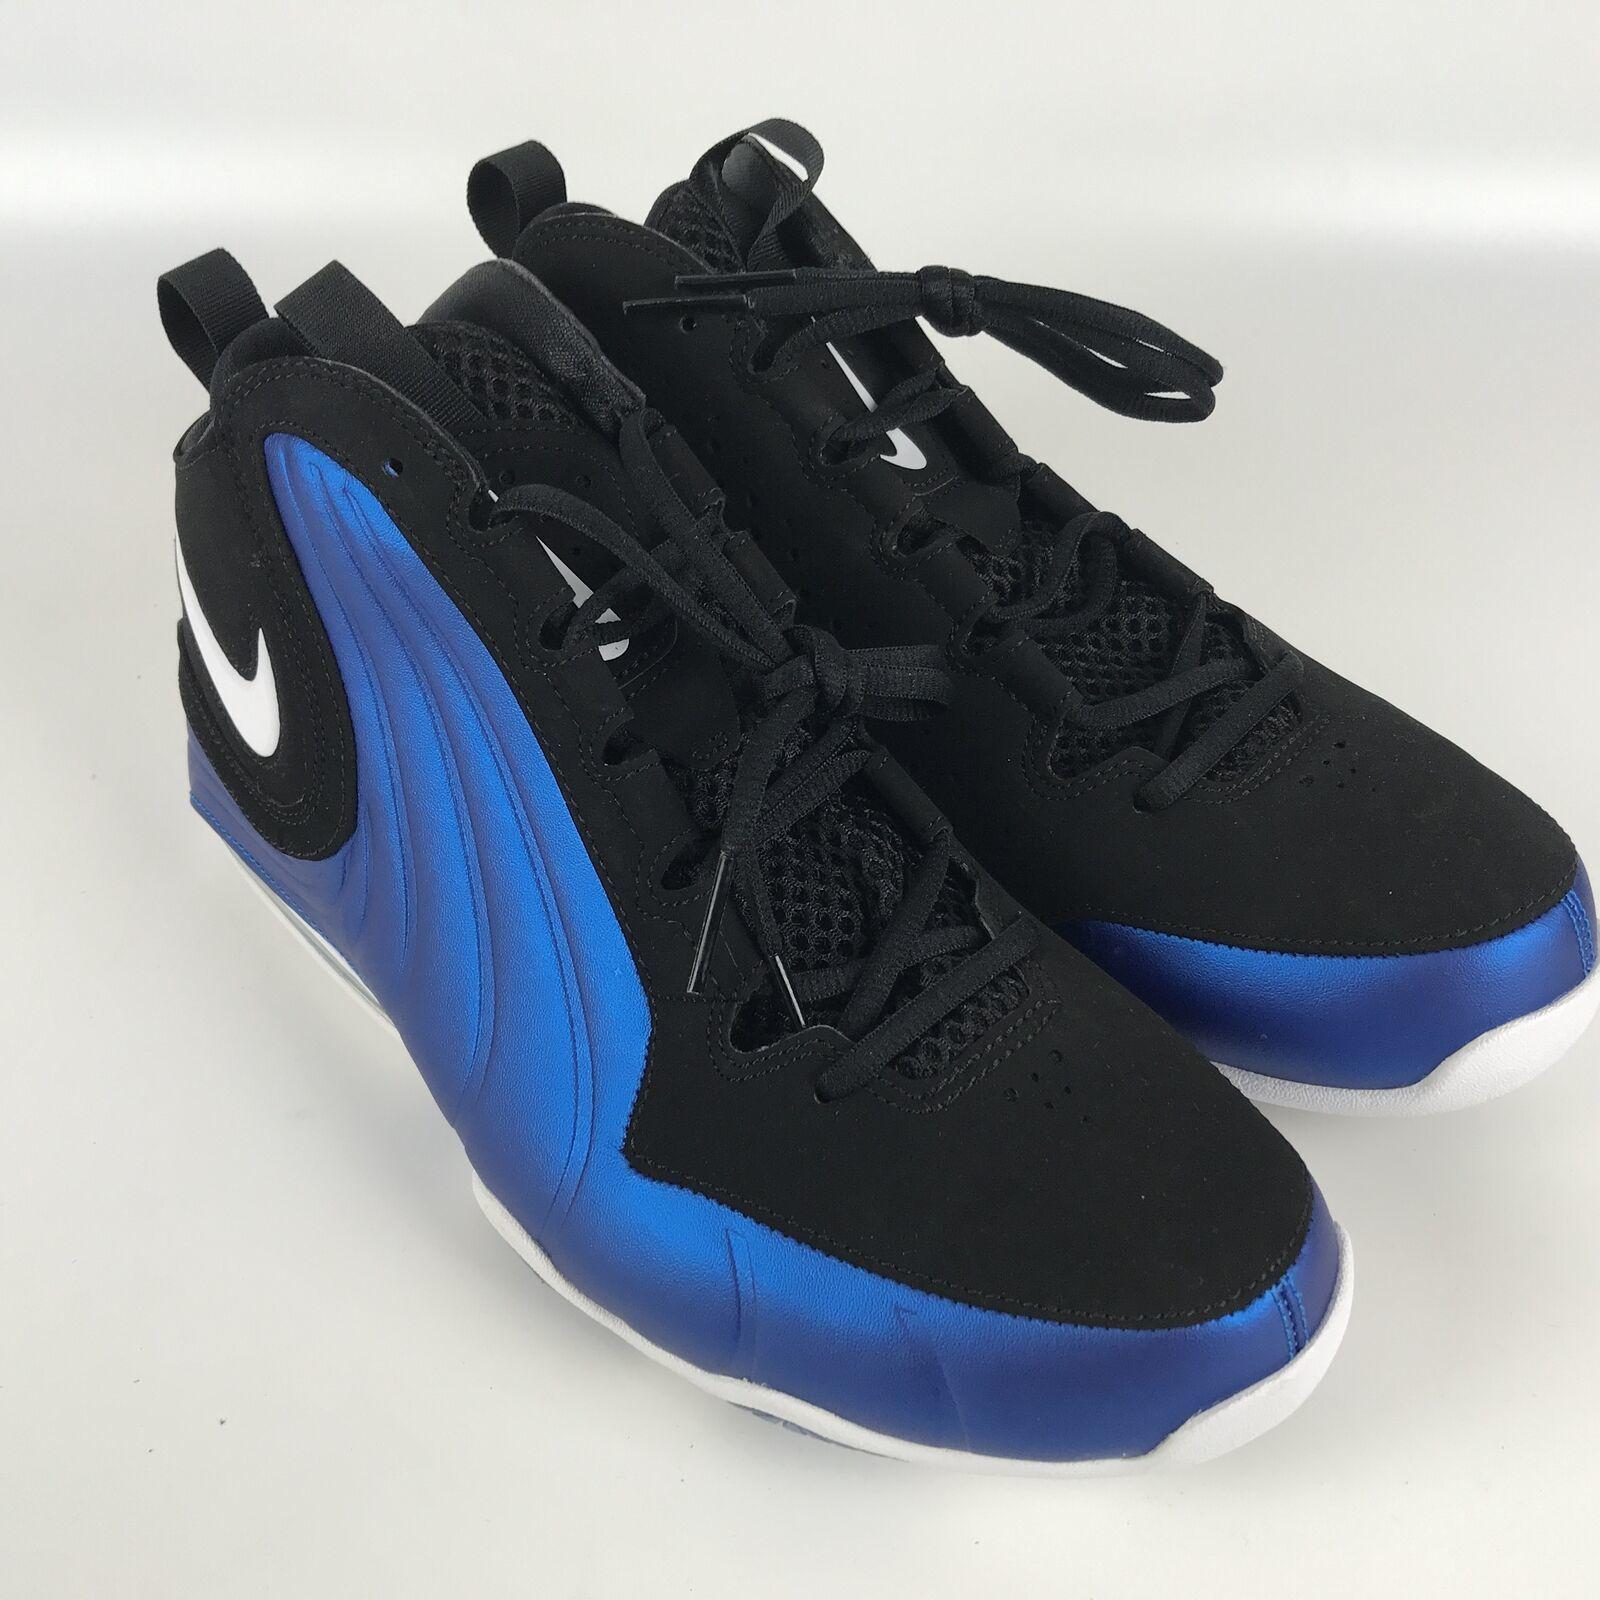 Nike Air Max WAVY Men's size 11 Basketball Shoes Penny Blue Black AV8061 002 image 2